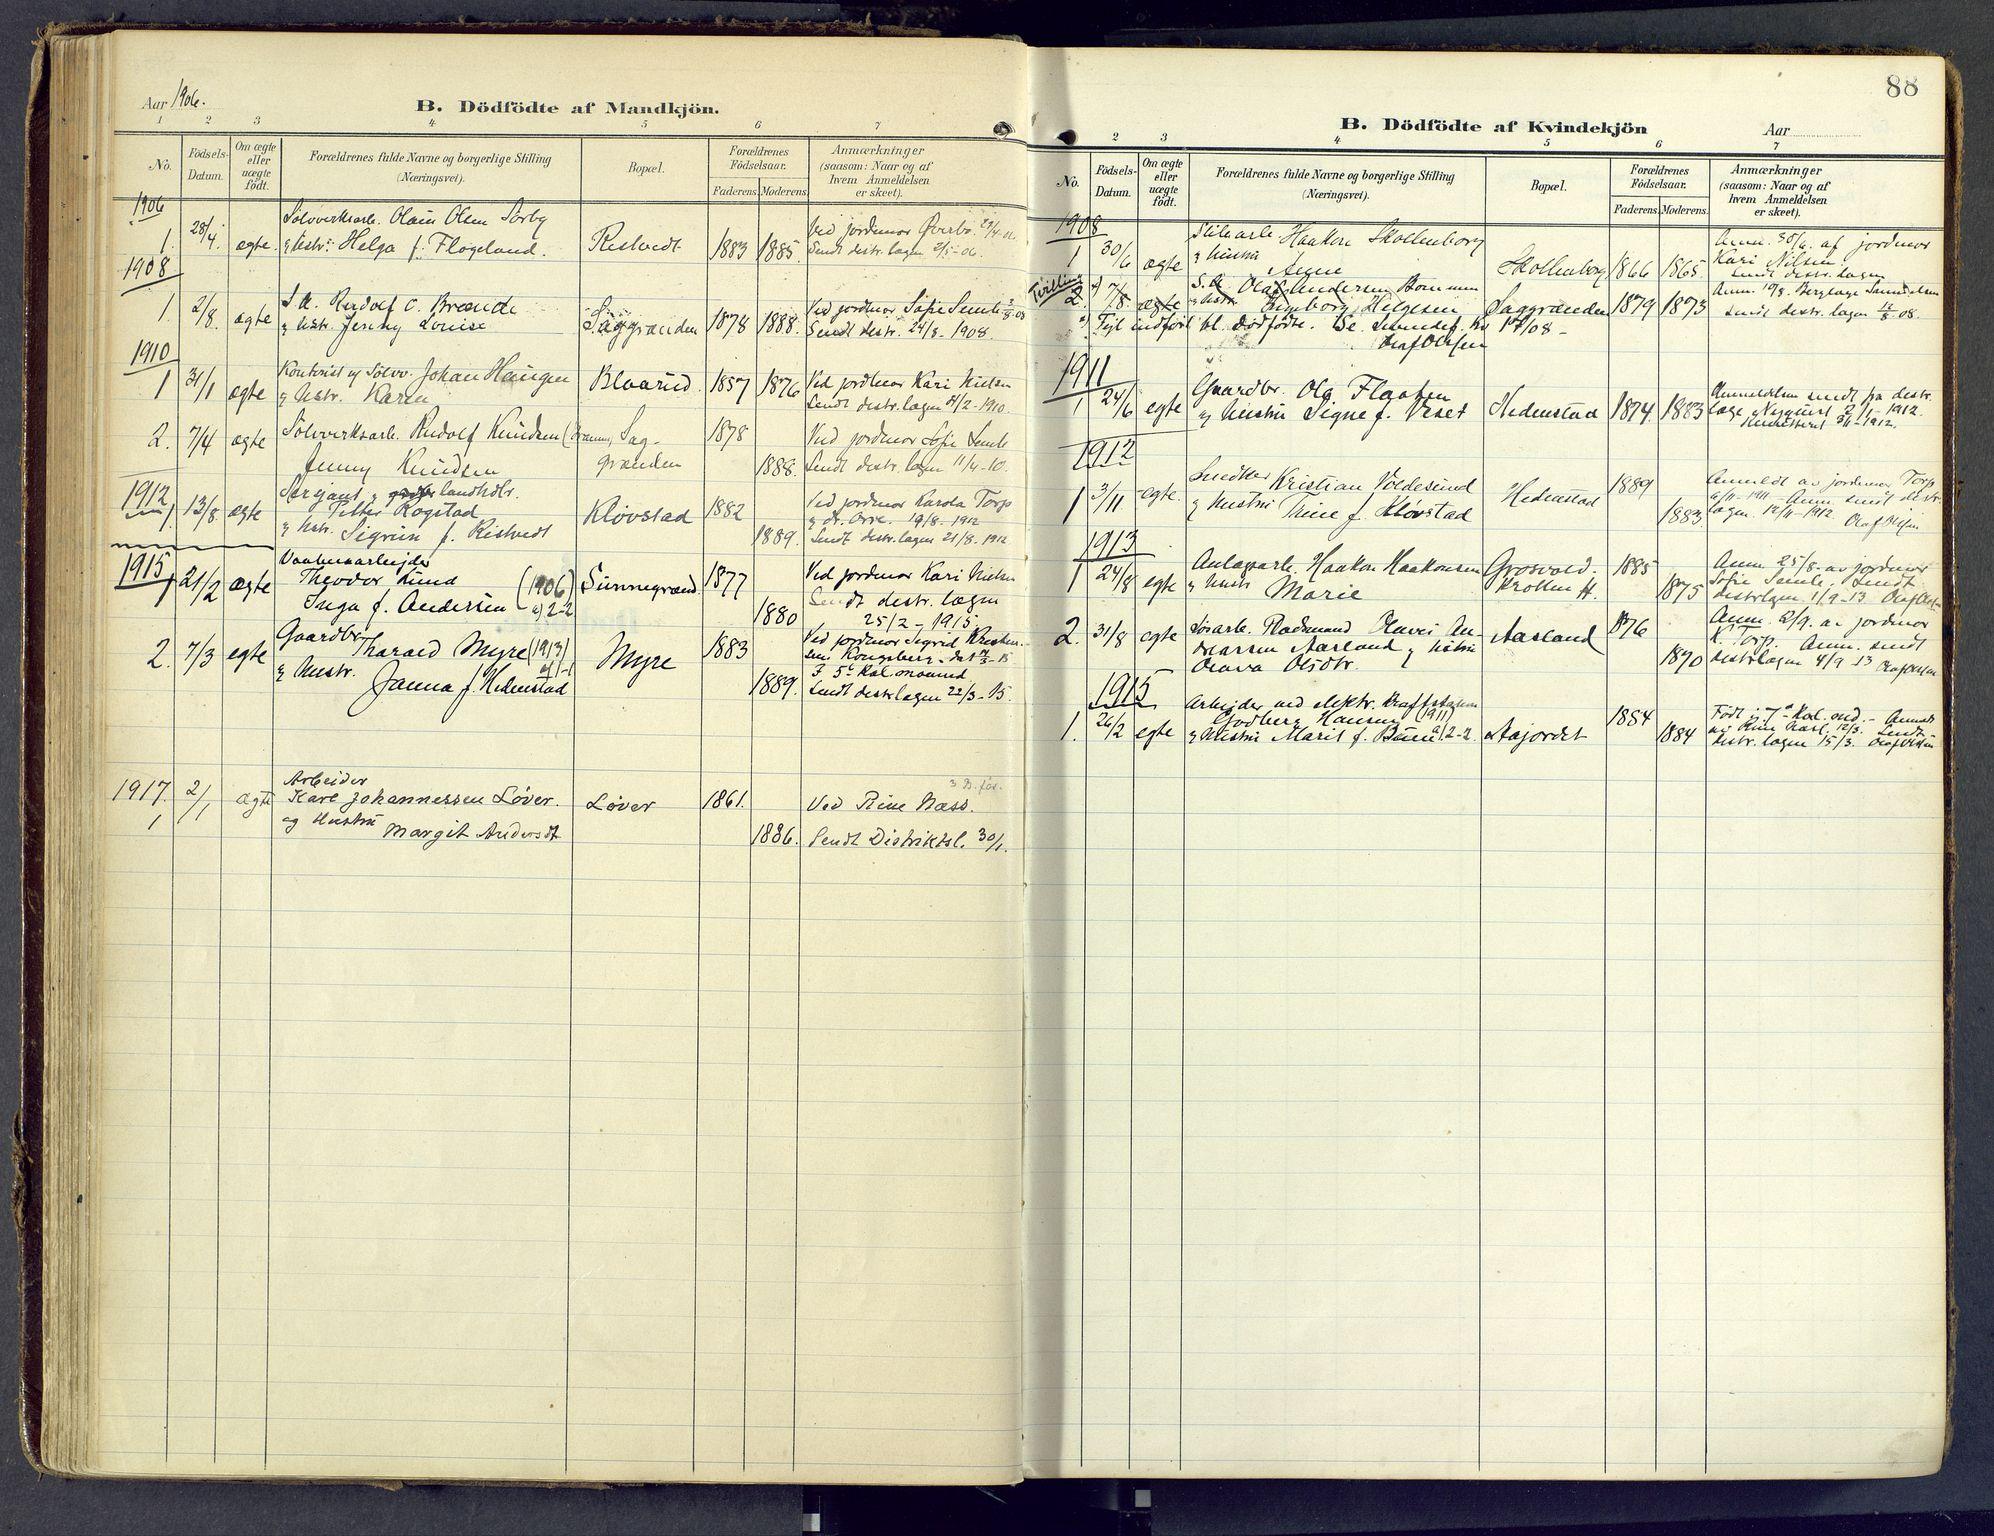 SAKO, Sandsvær kirkebøker, F/Fd/L0002: Ministerialbok nr. IV 2, 1906-1943, s. 88